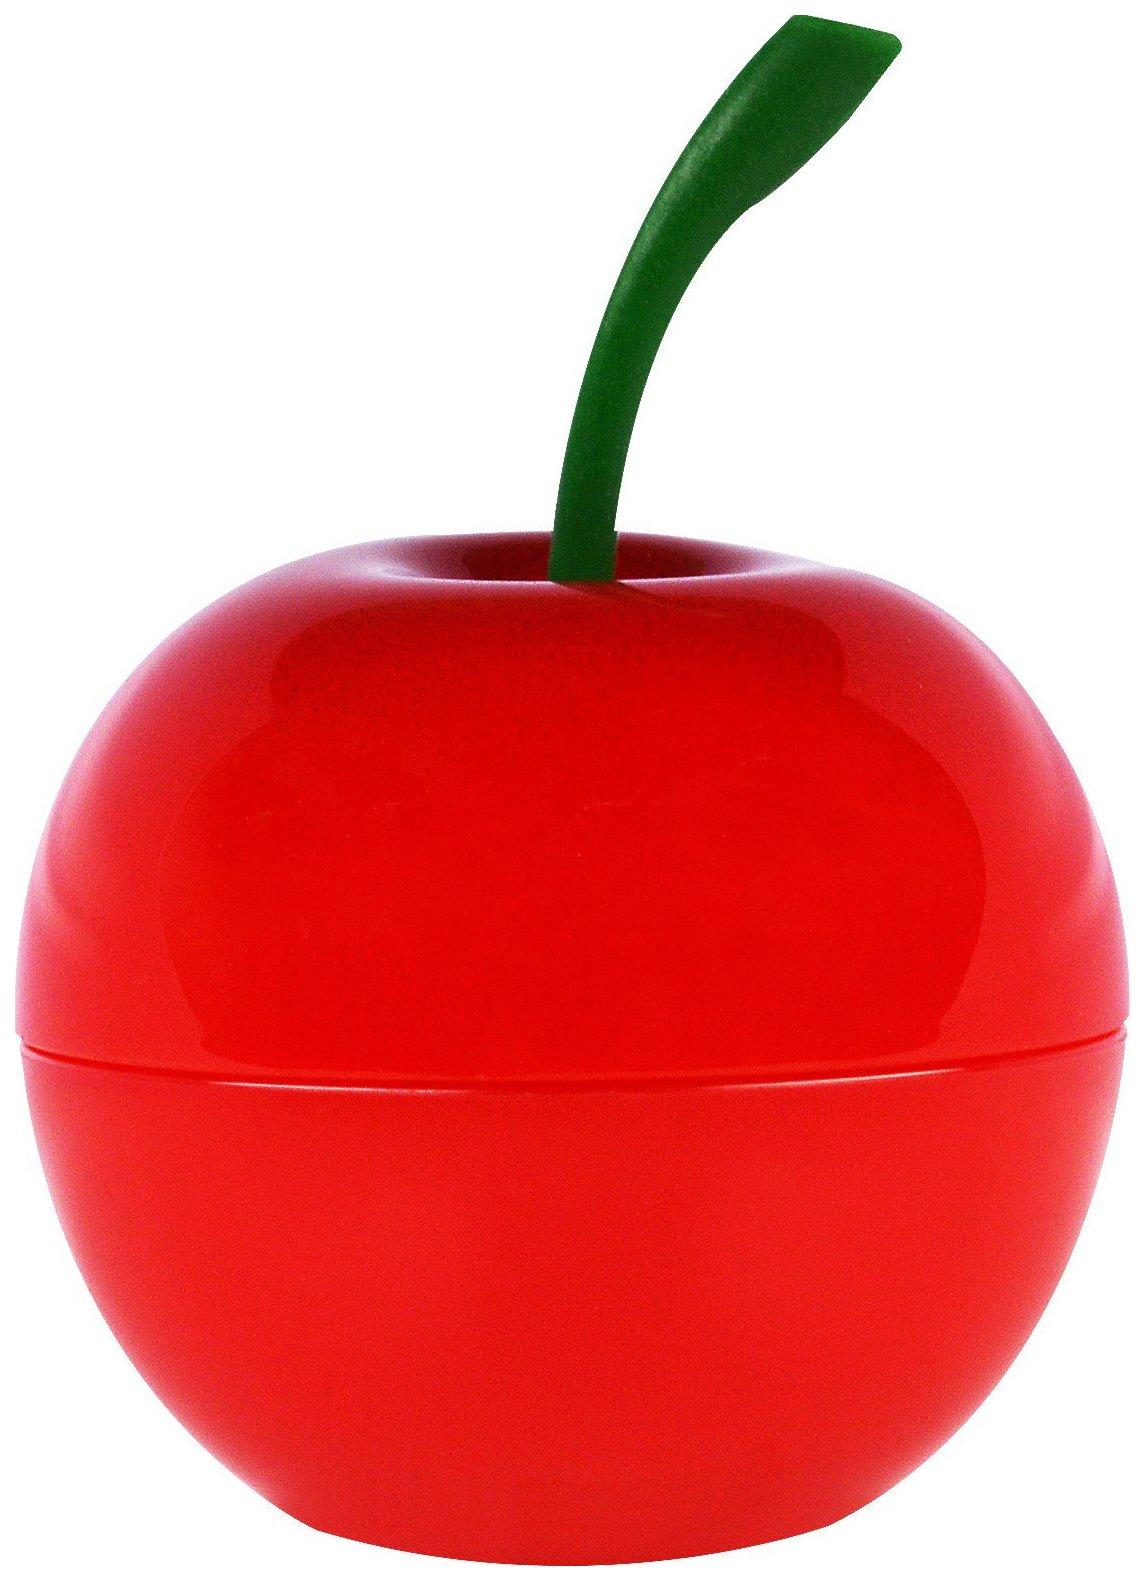 Бальзам для губ Tony Moly Mini Berry